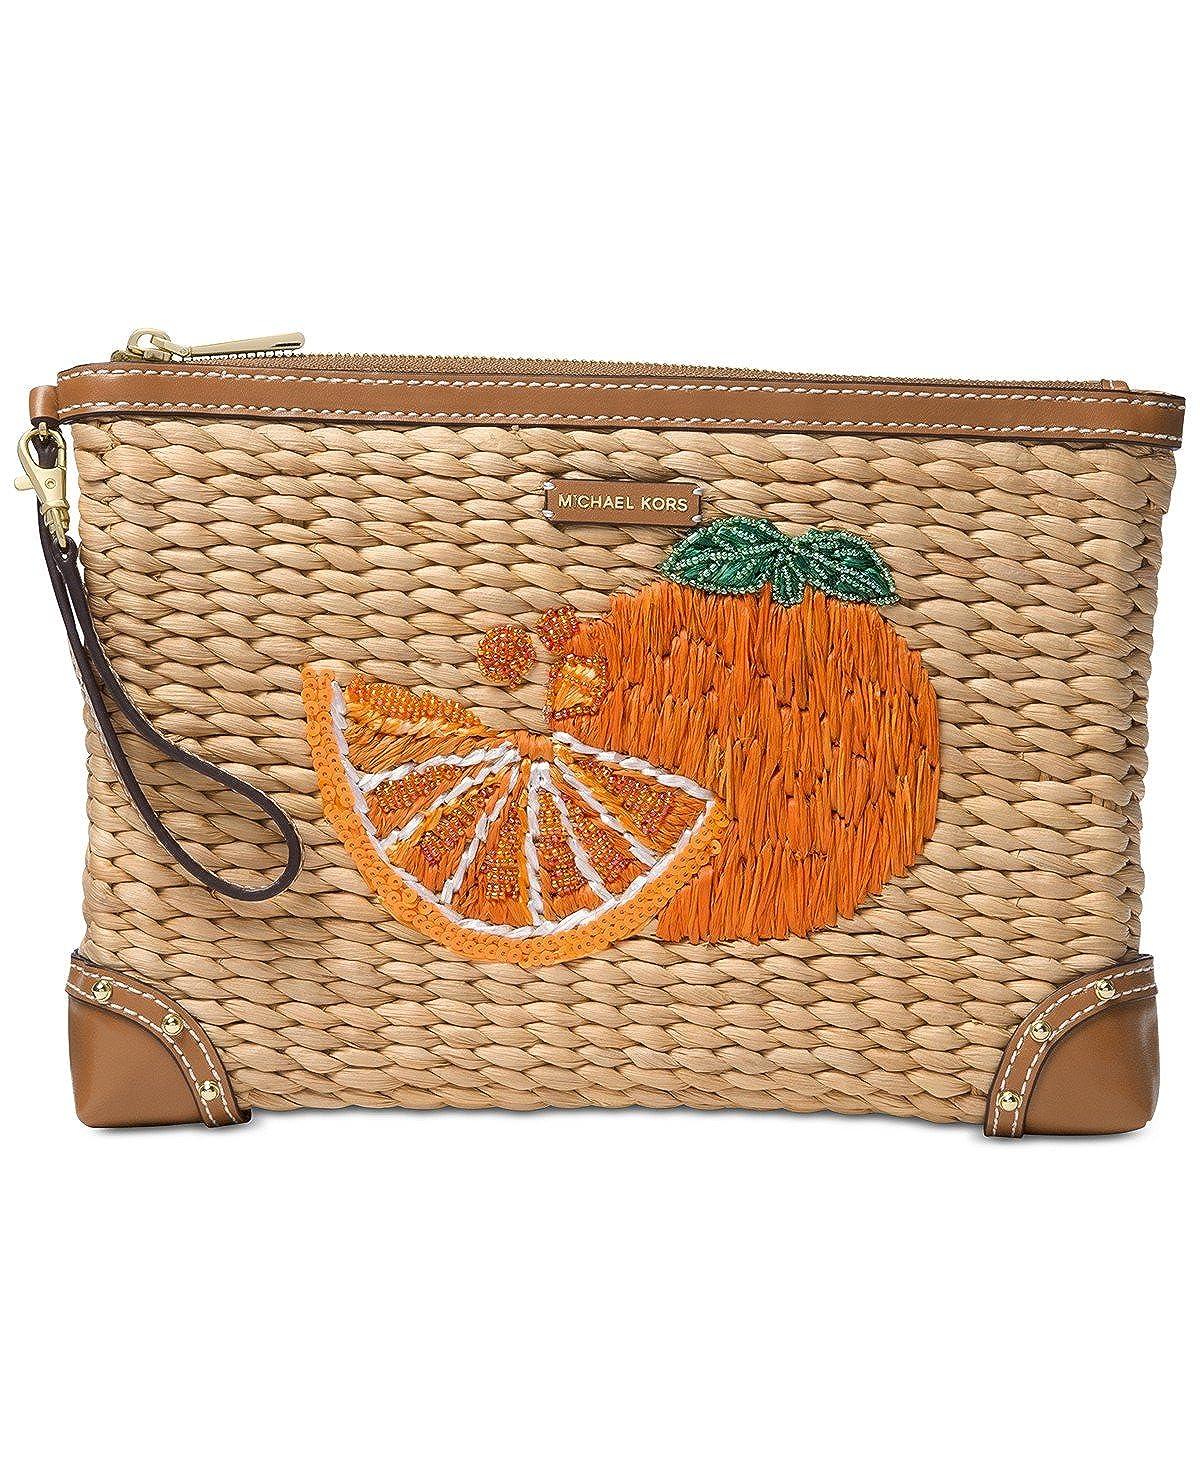 d756d32e823e Michael Kors Extra Large Woven Malibu Orange Zip Clutch, Natural/Tangerine:  Handbags: Amazon.com